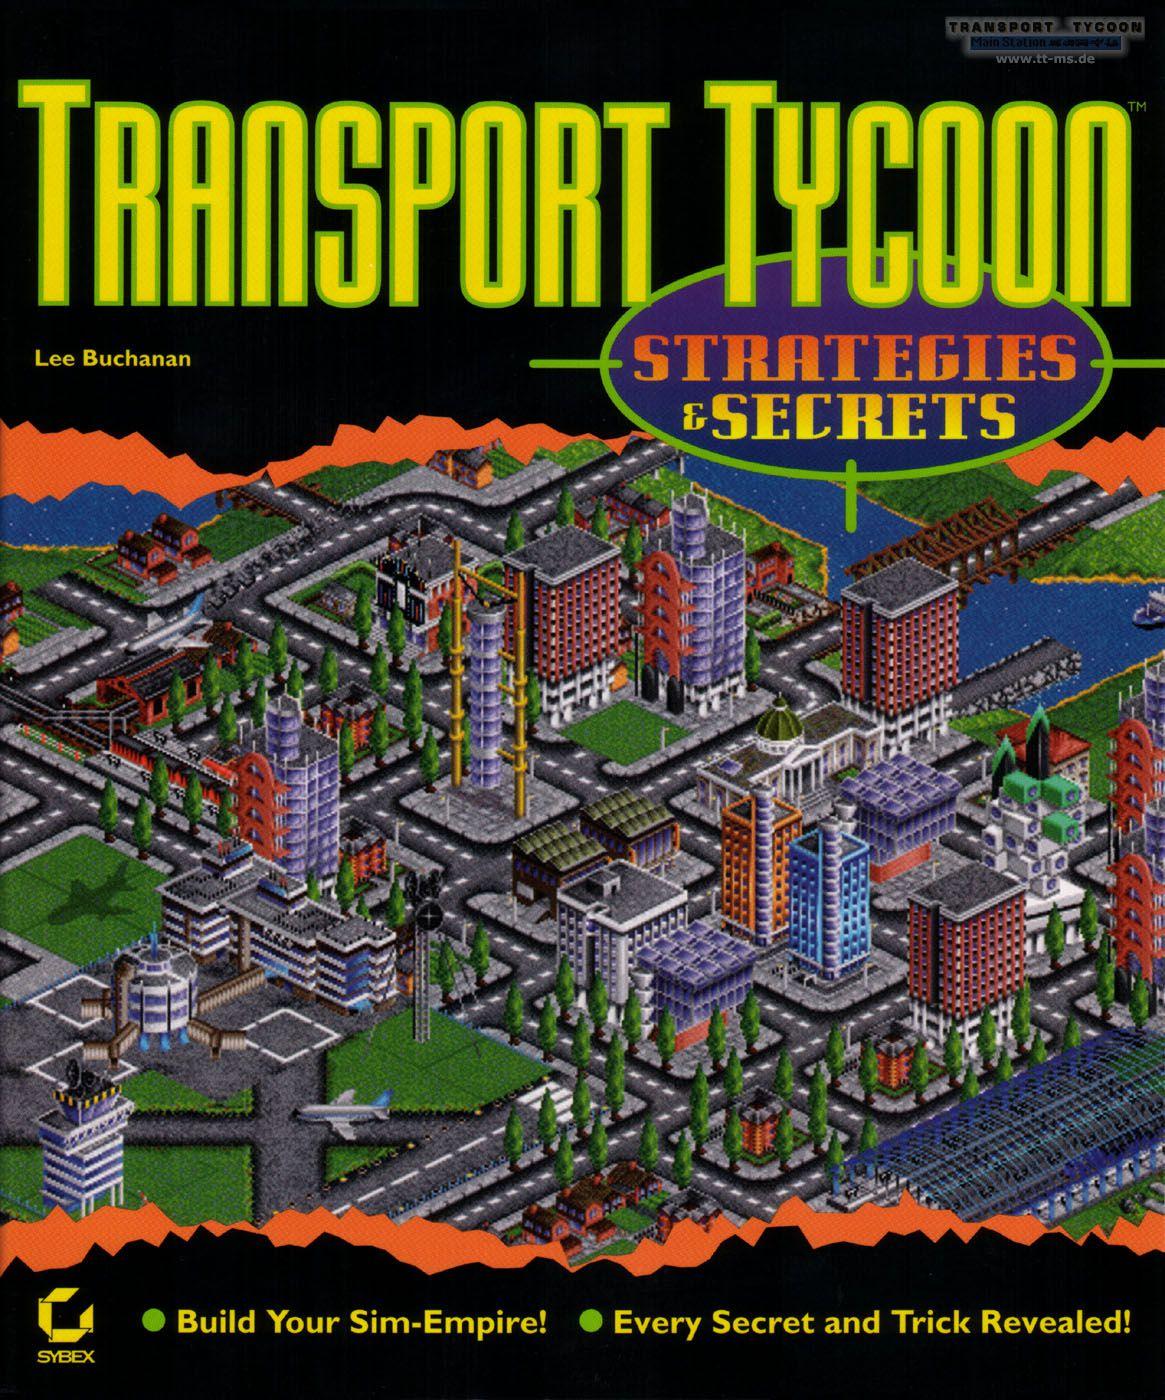 01-die-top-5-retro-games-transport-tycoon-80.jpg?nocache=1321354447398